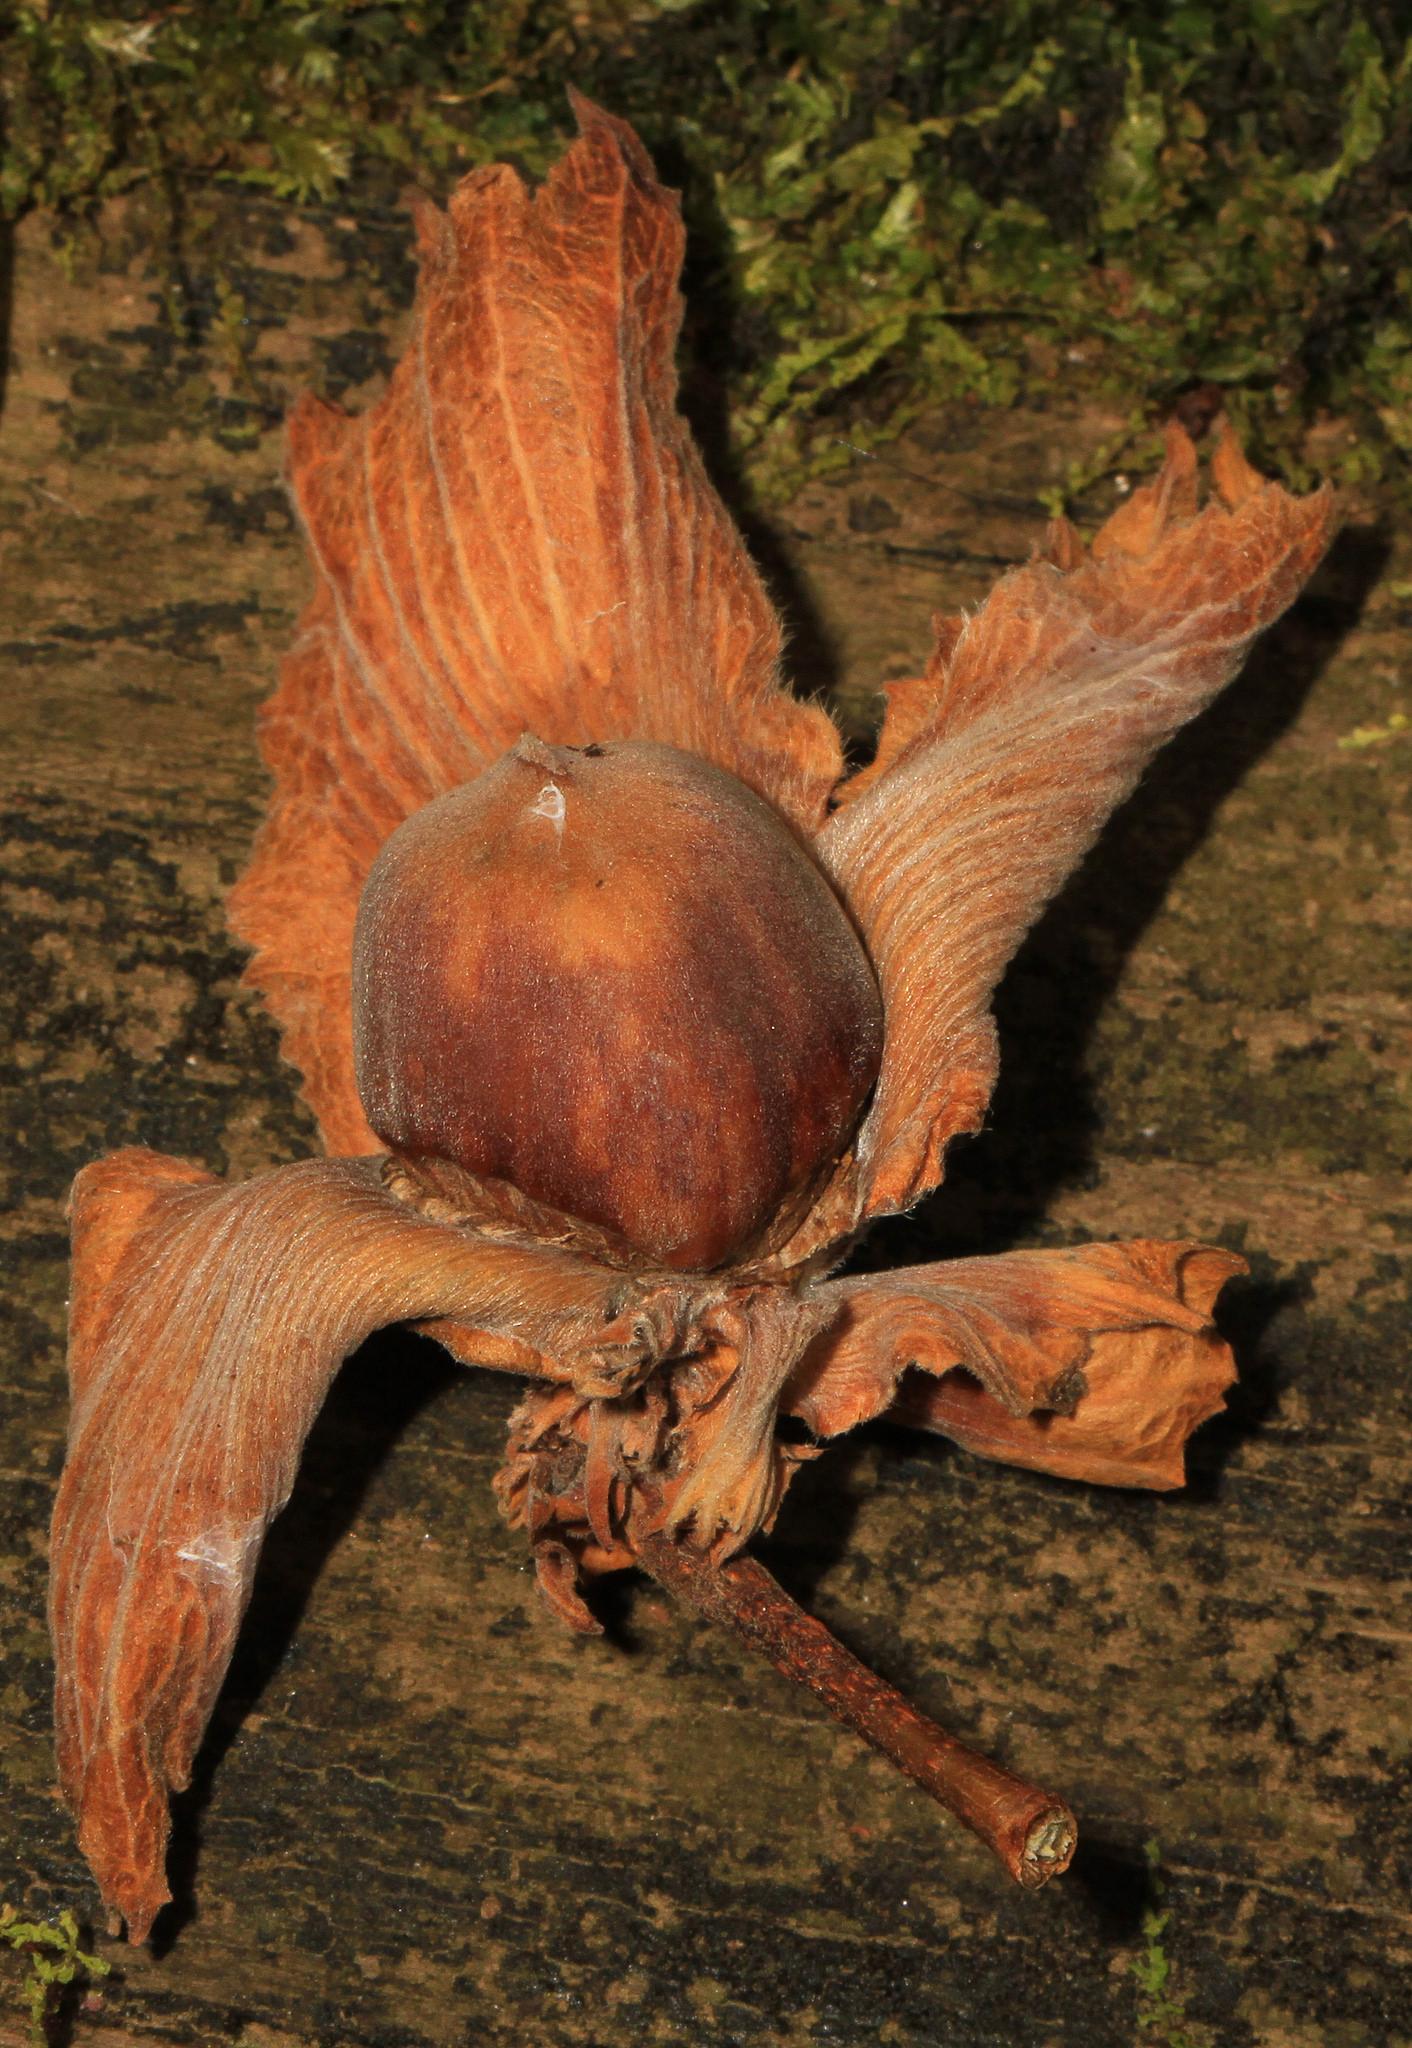 Harvested American Hazelnut